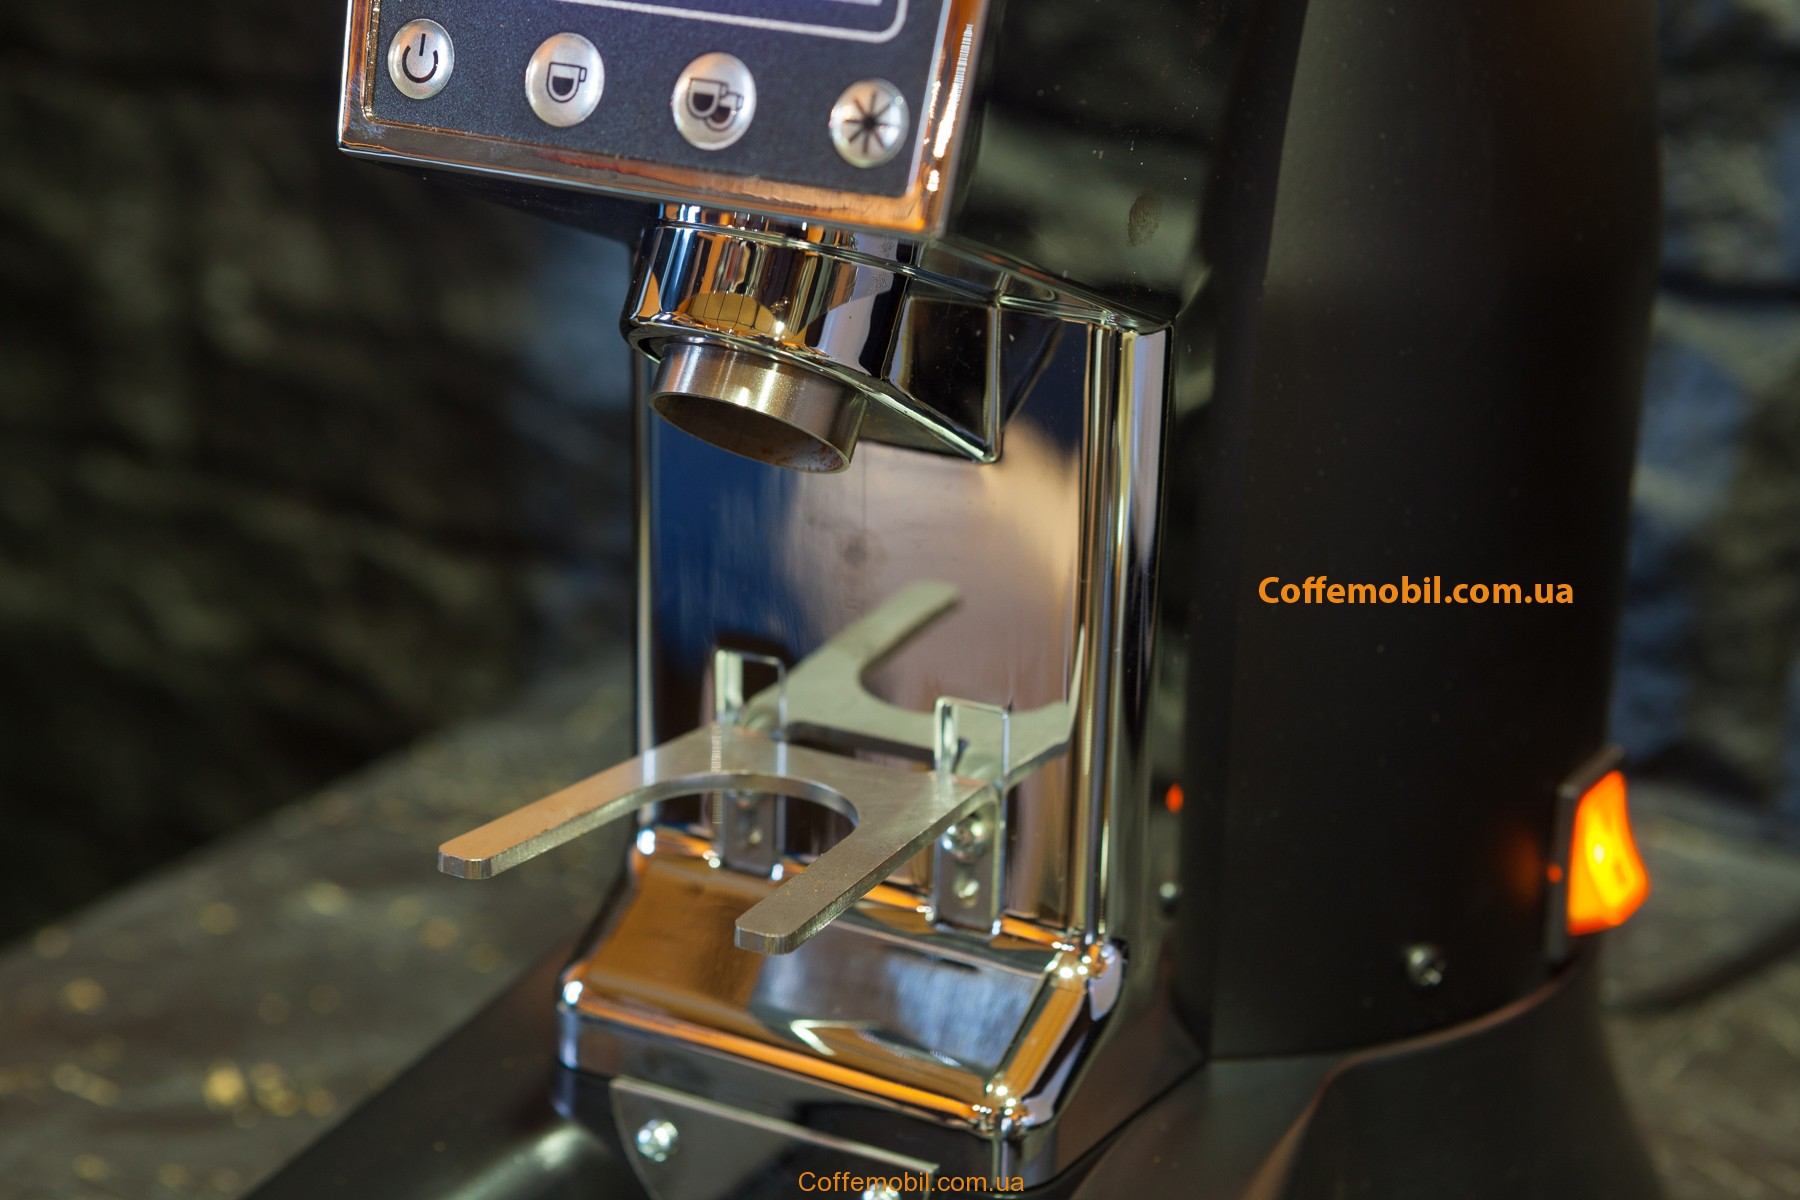 obel mito istantaneo новая кофемолка